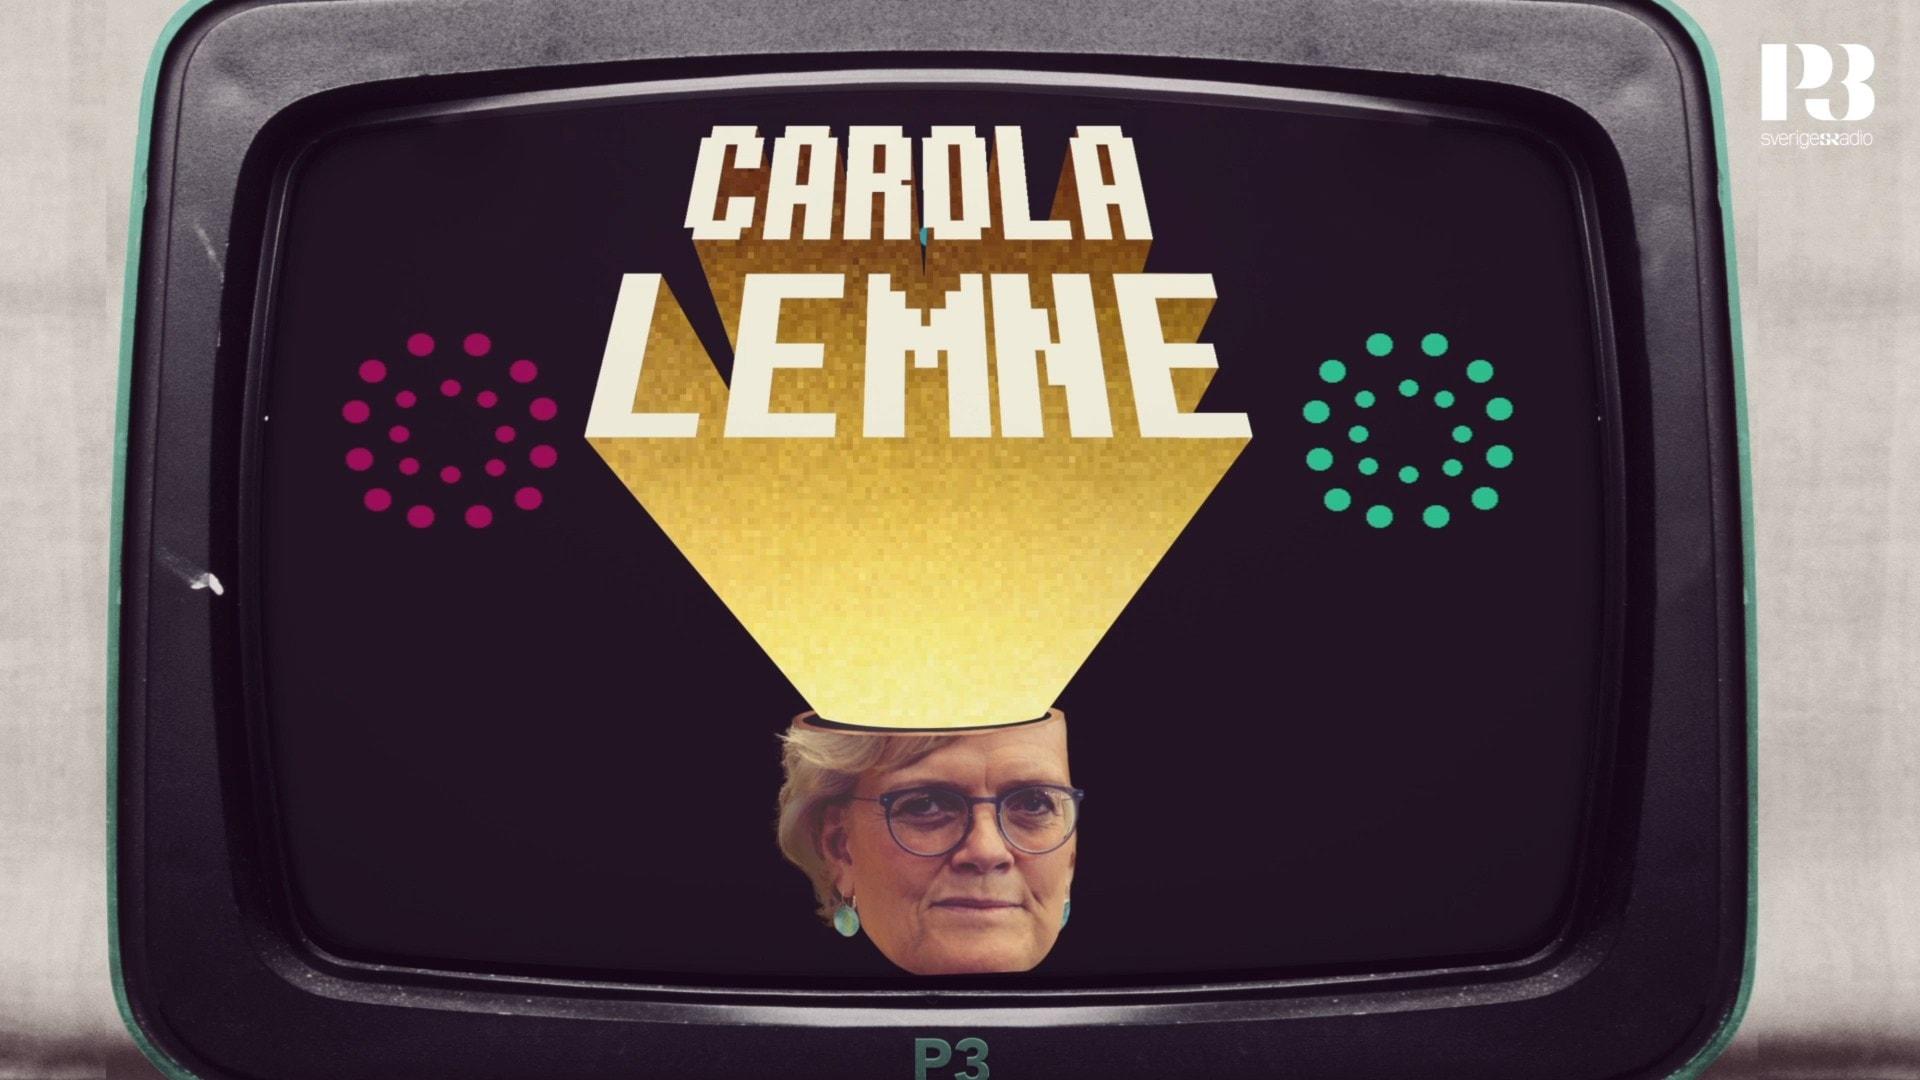 #52. Carola Lemne – chefen över alla jobb